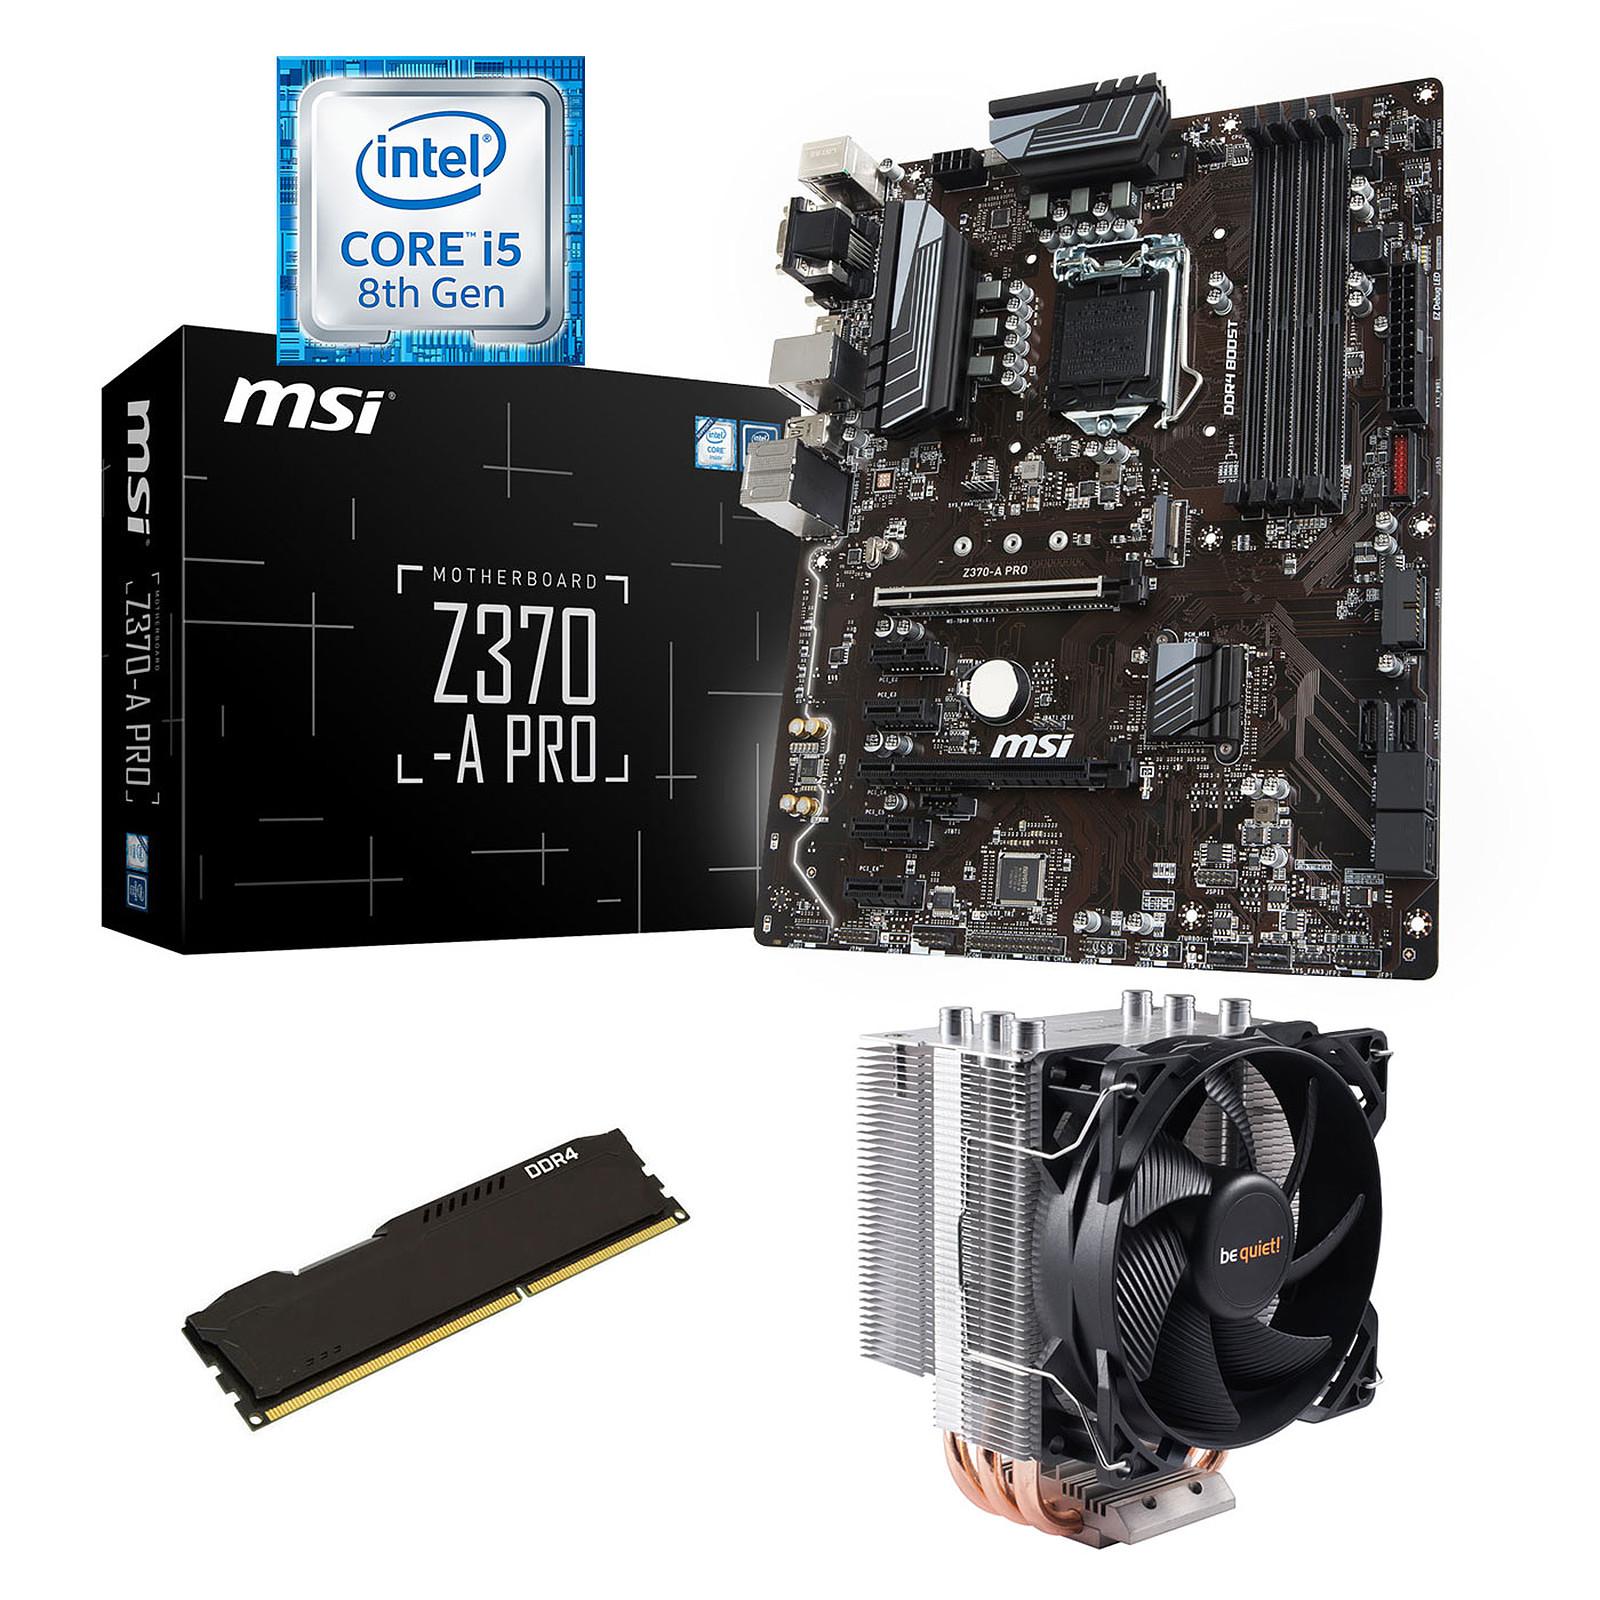 Kit Upgrade PC Core i5 MSI Z370-A PRO 4 Go